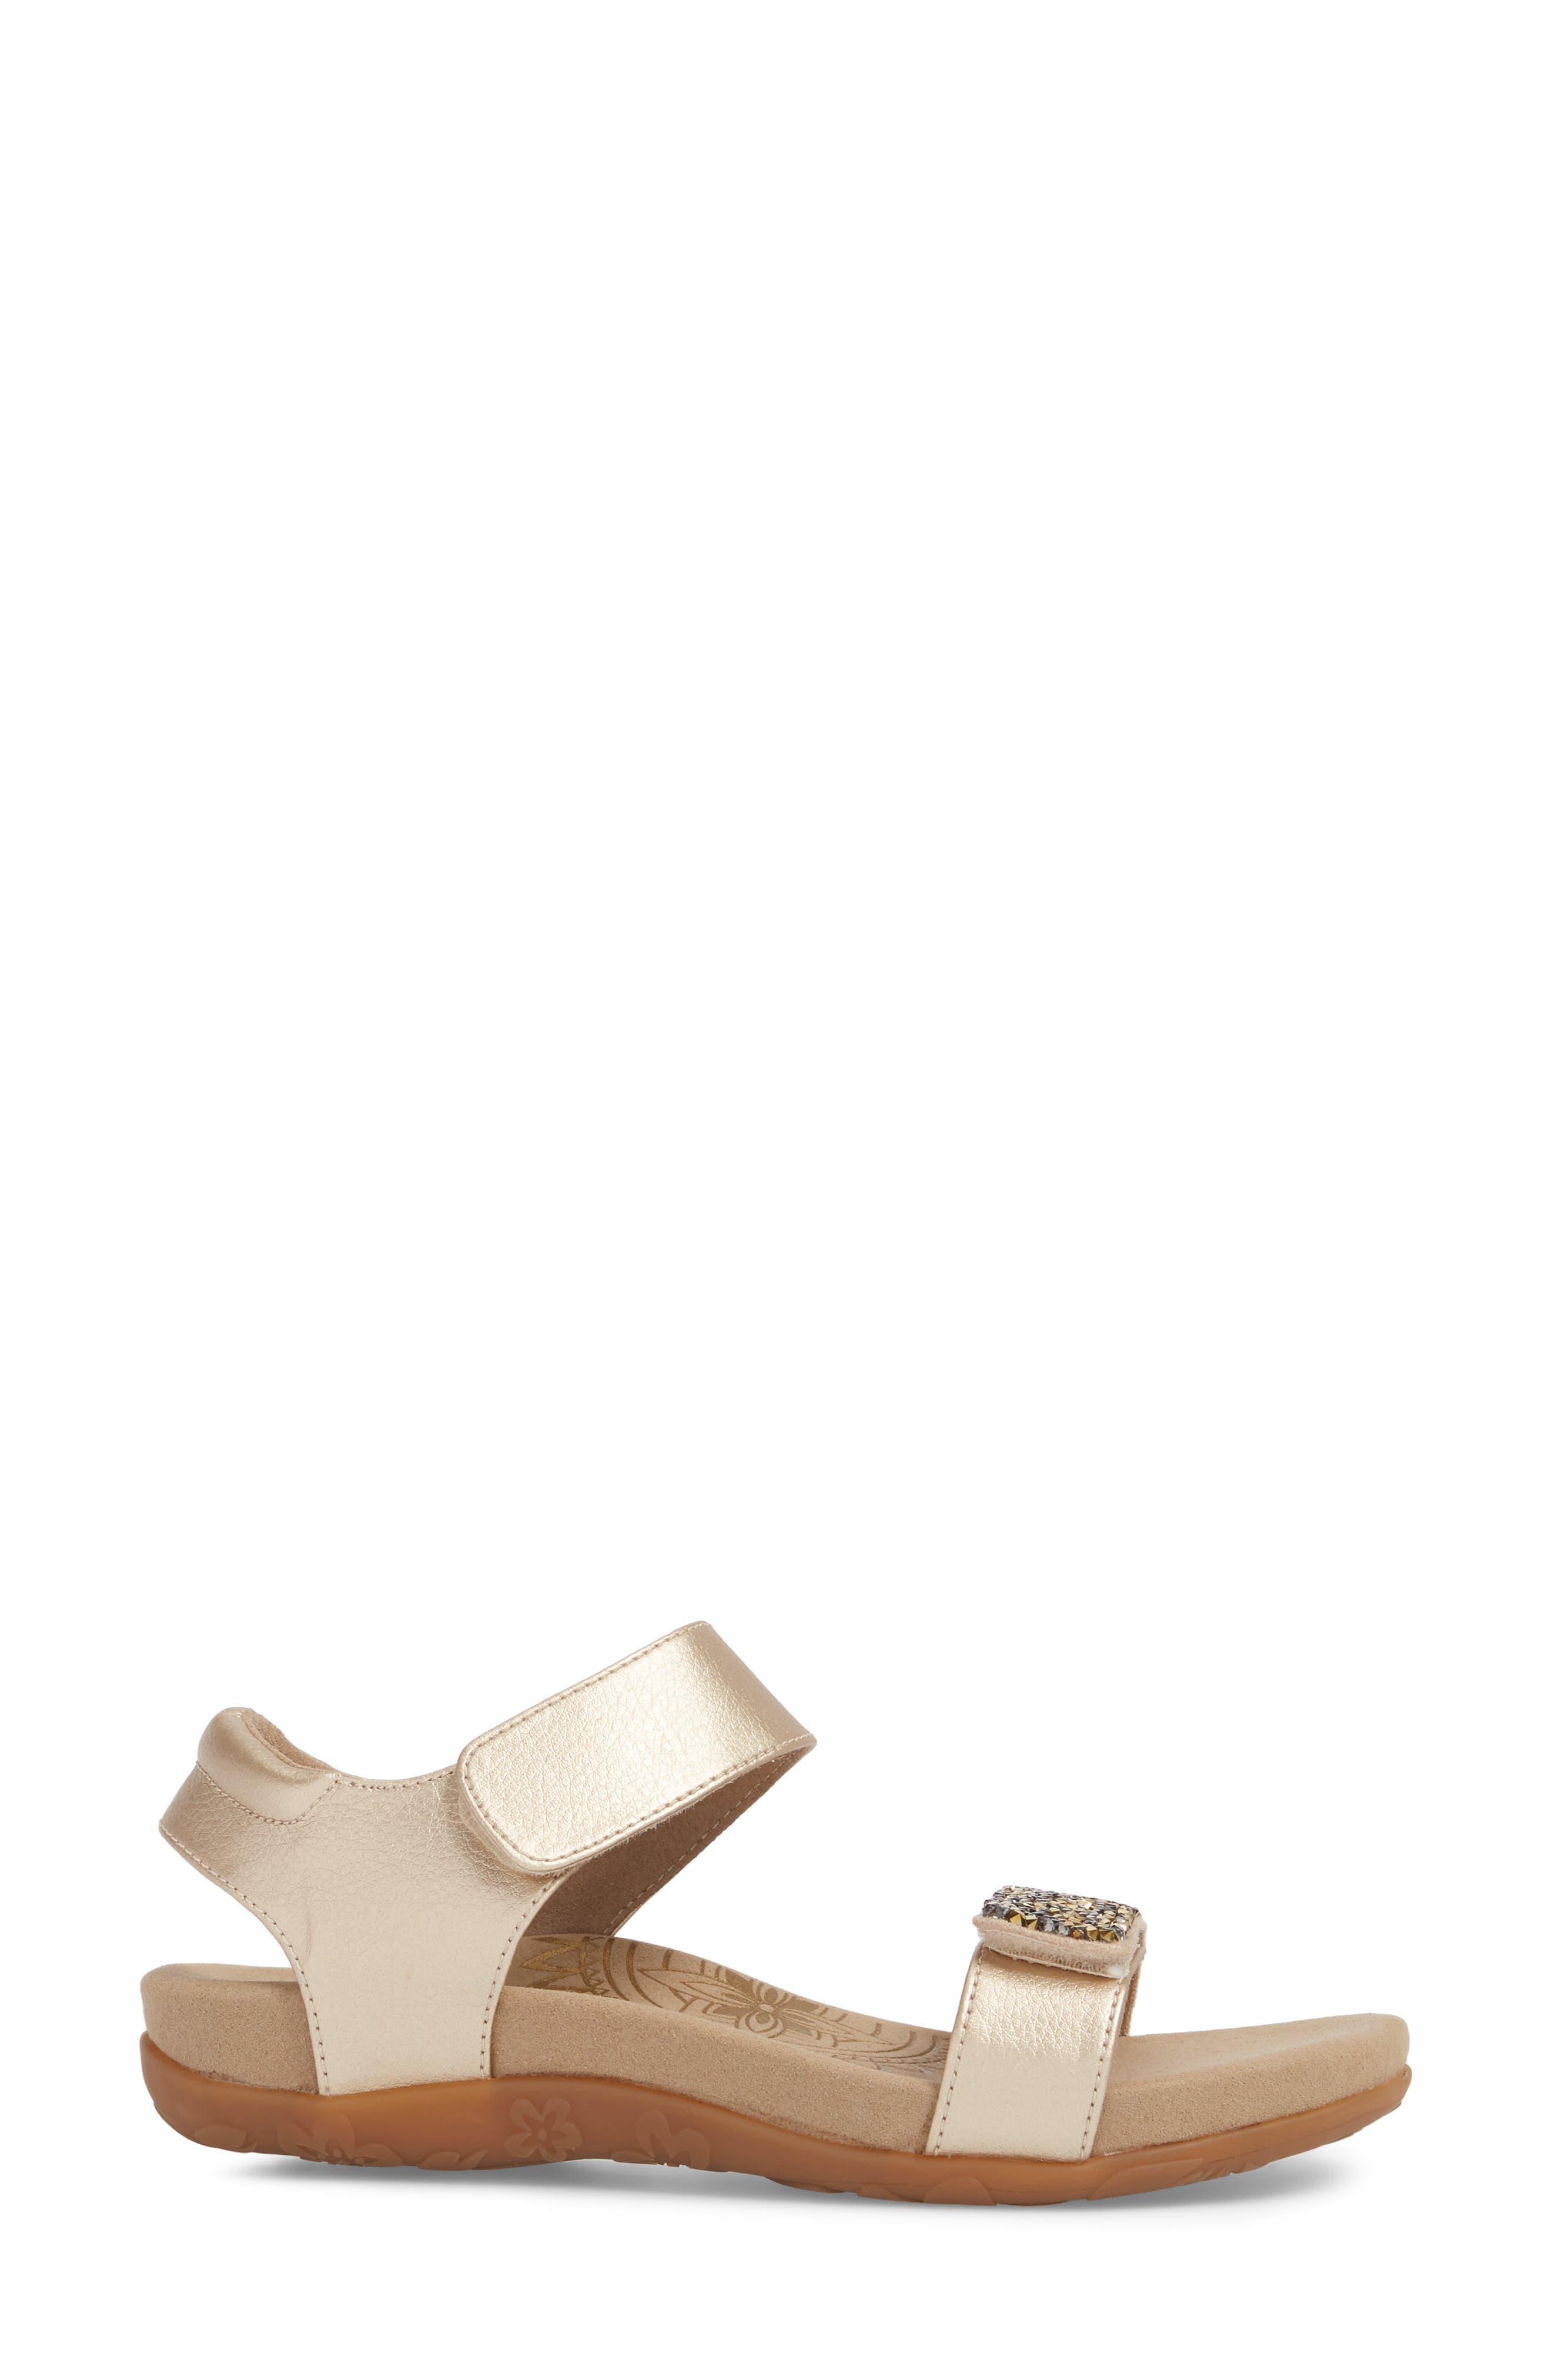 Maria Embellished Sandal,                             Alternate thumbnail 3, color,                             Gold Leather